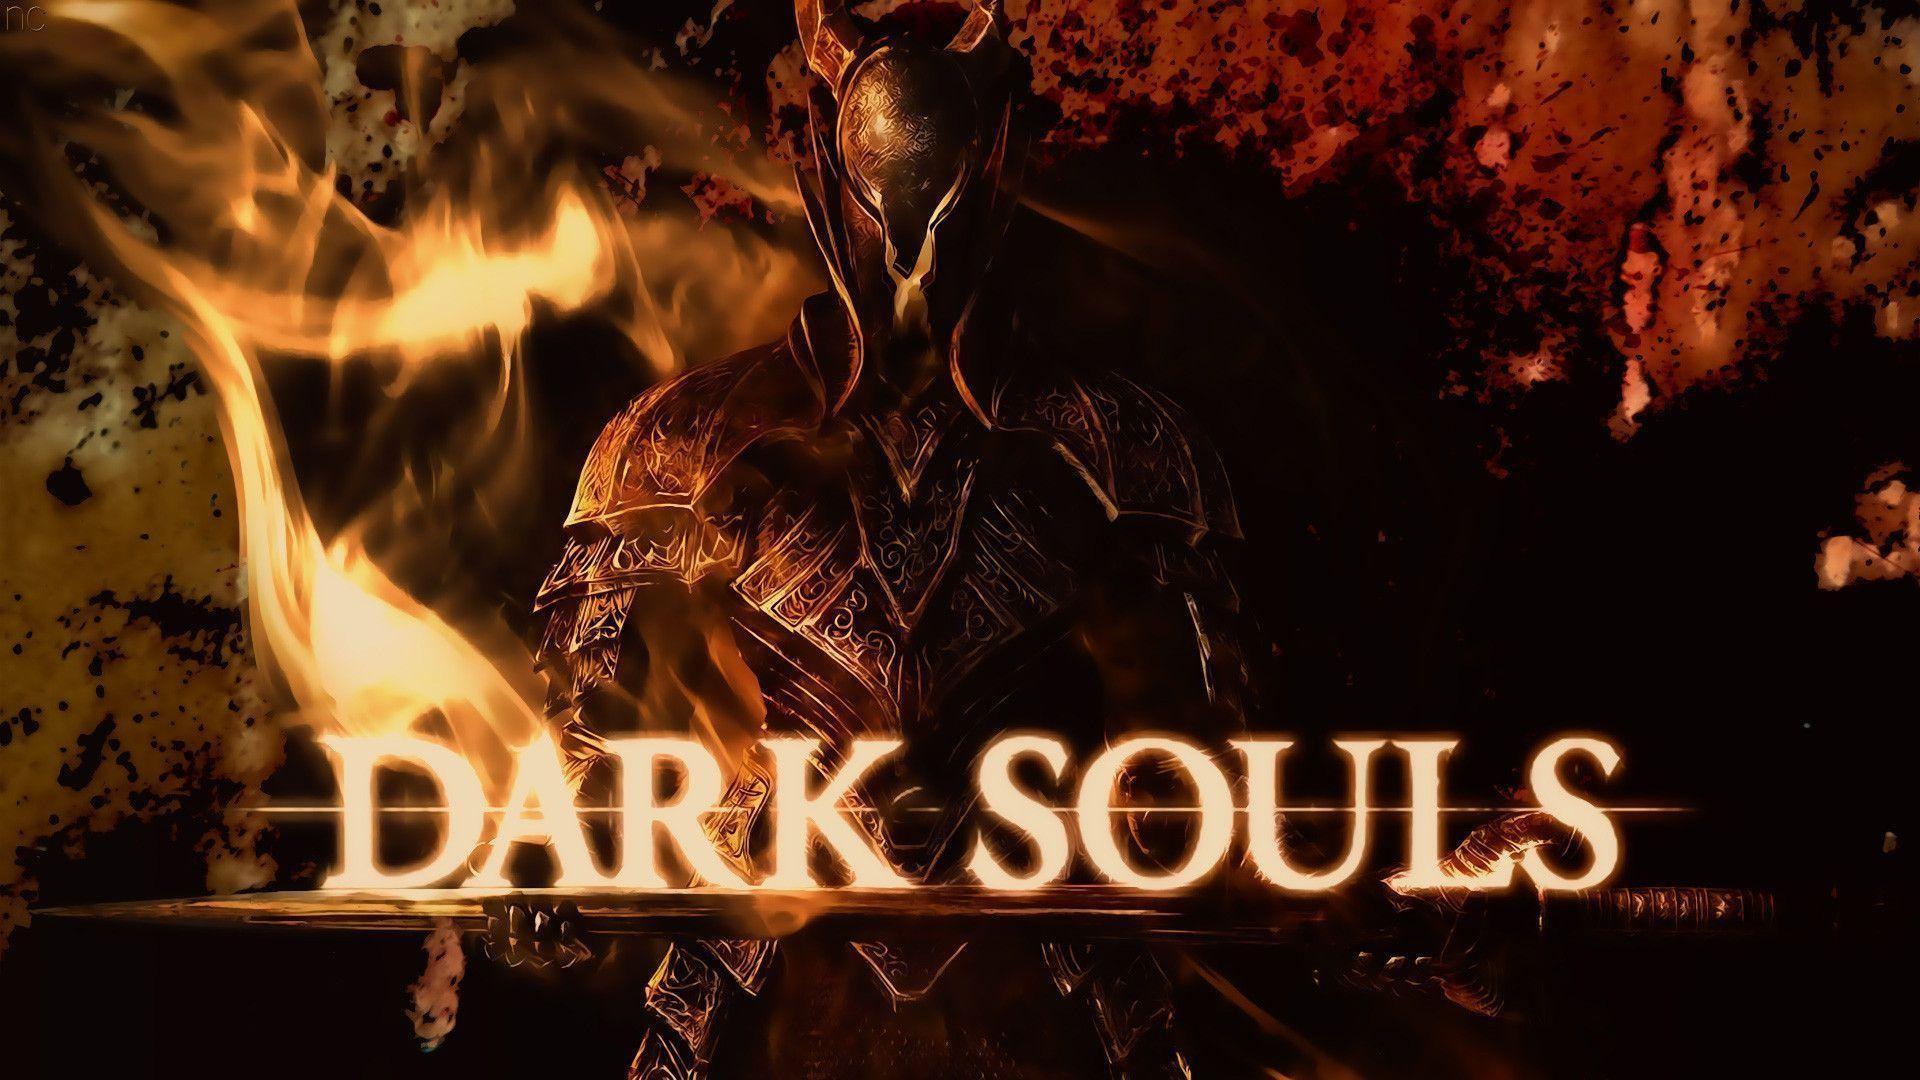 Dark Souls Wallpapers in HD